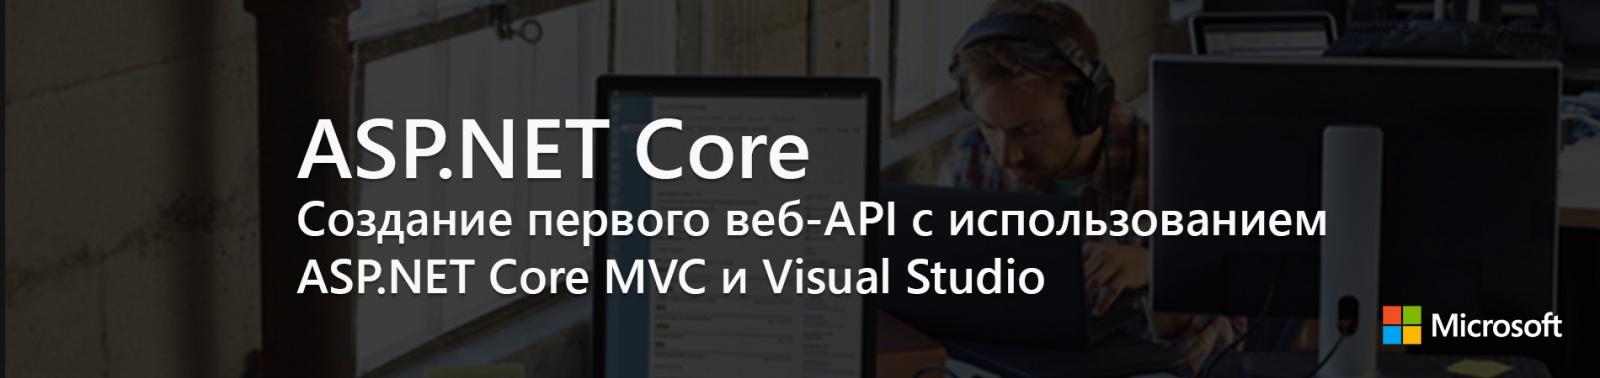 ASP.NET Core: Создание первого веб-API с использованием ASP.NET Core MVC и Visual Studio - 1